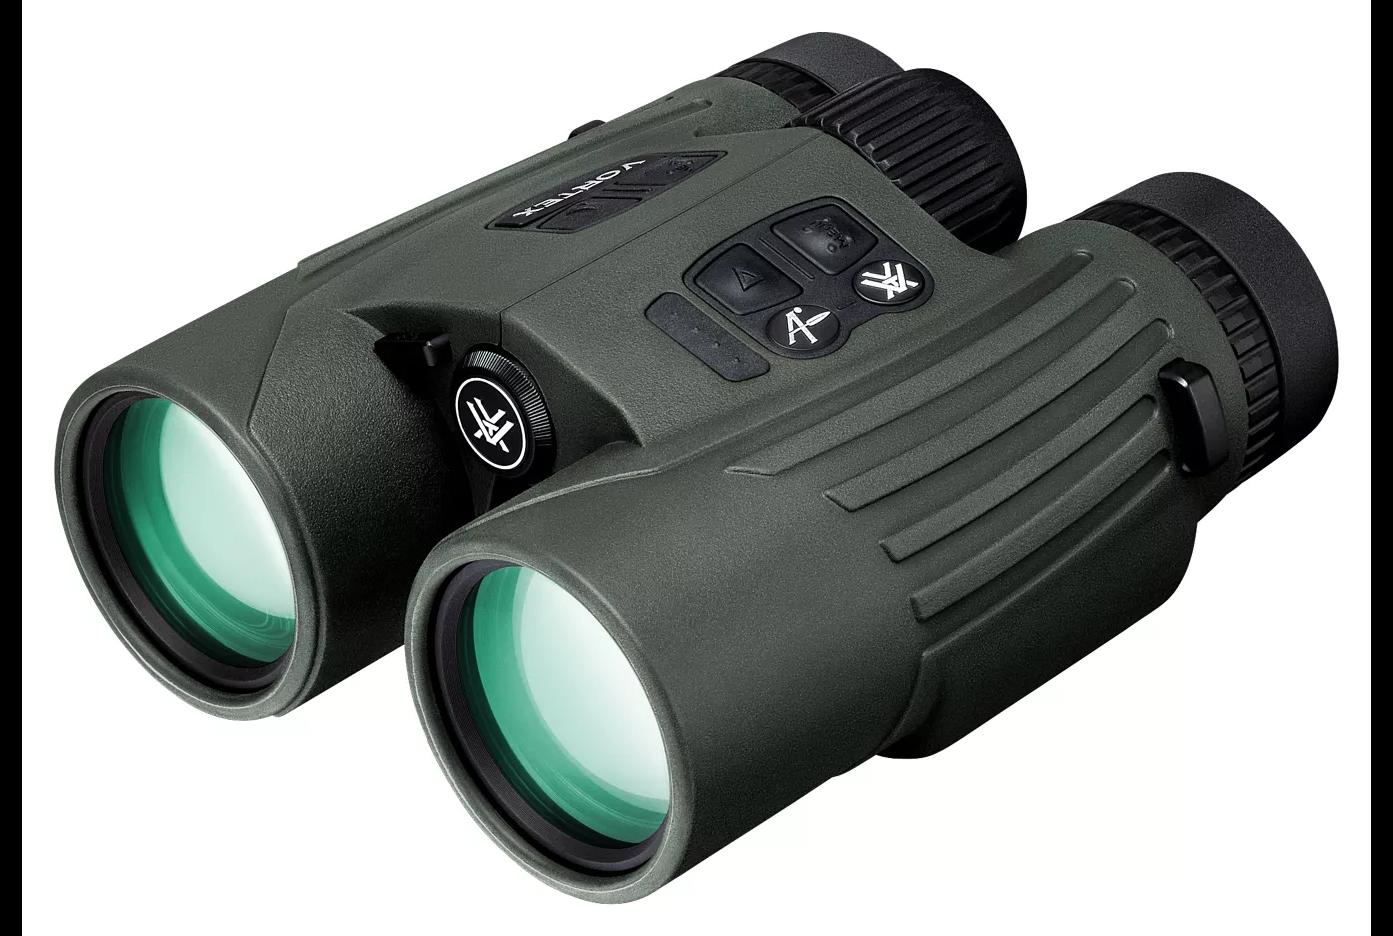 Vortex fury rangefinding binoculars